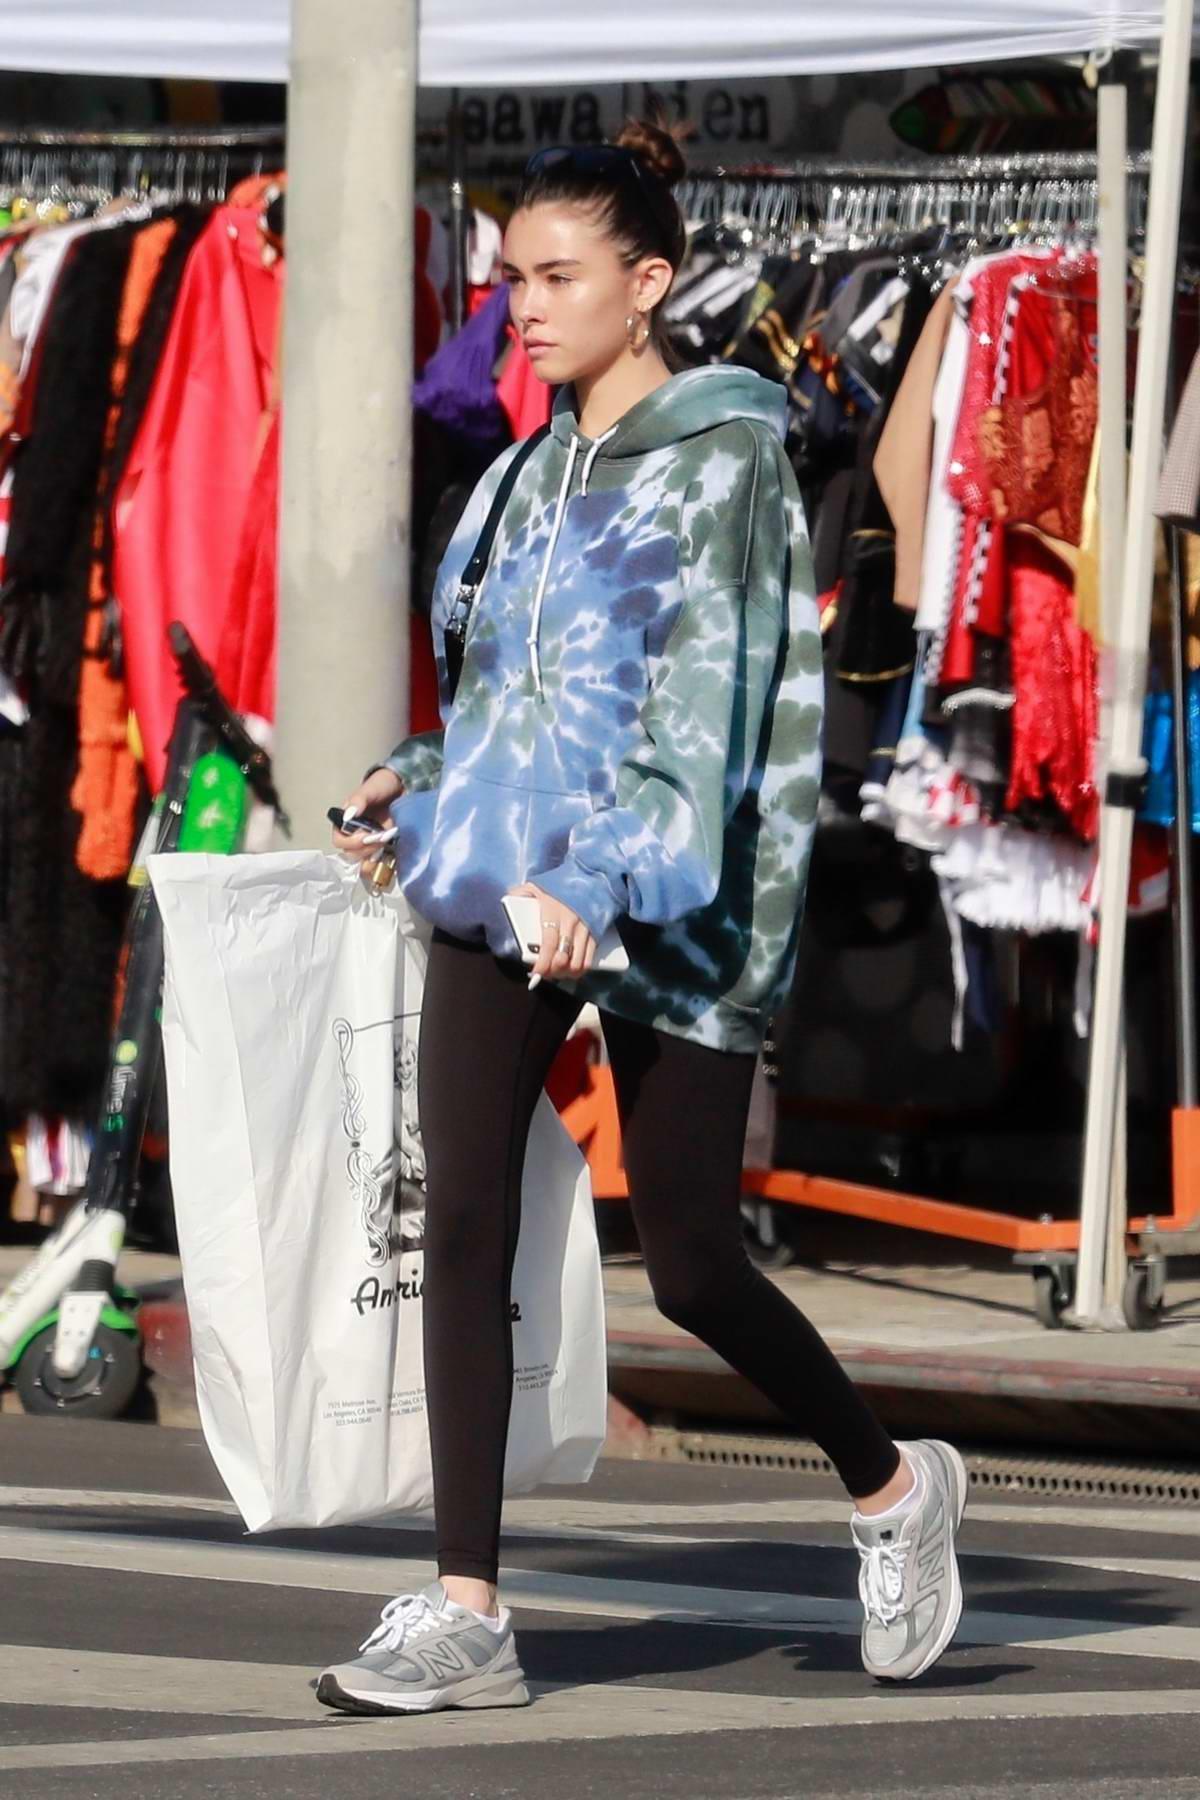 Madison Beer wears a tie-dye hoodie and black leggings during a shopping trip to American Vintage in Los Angeles